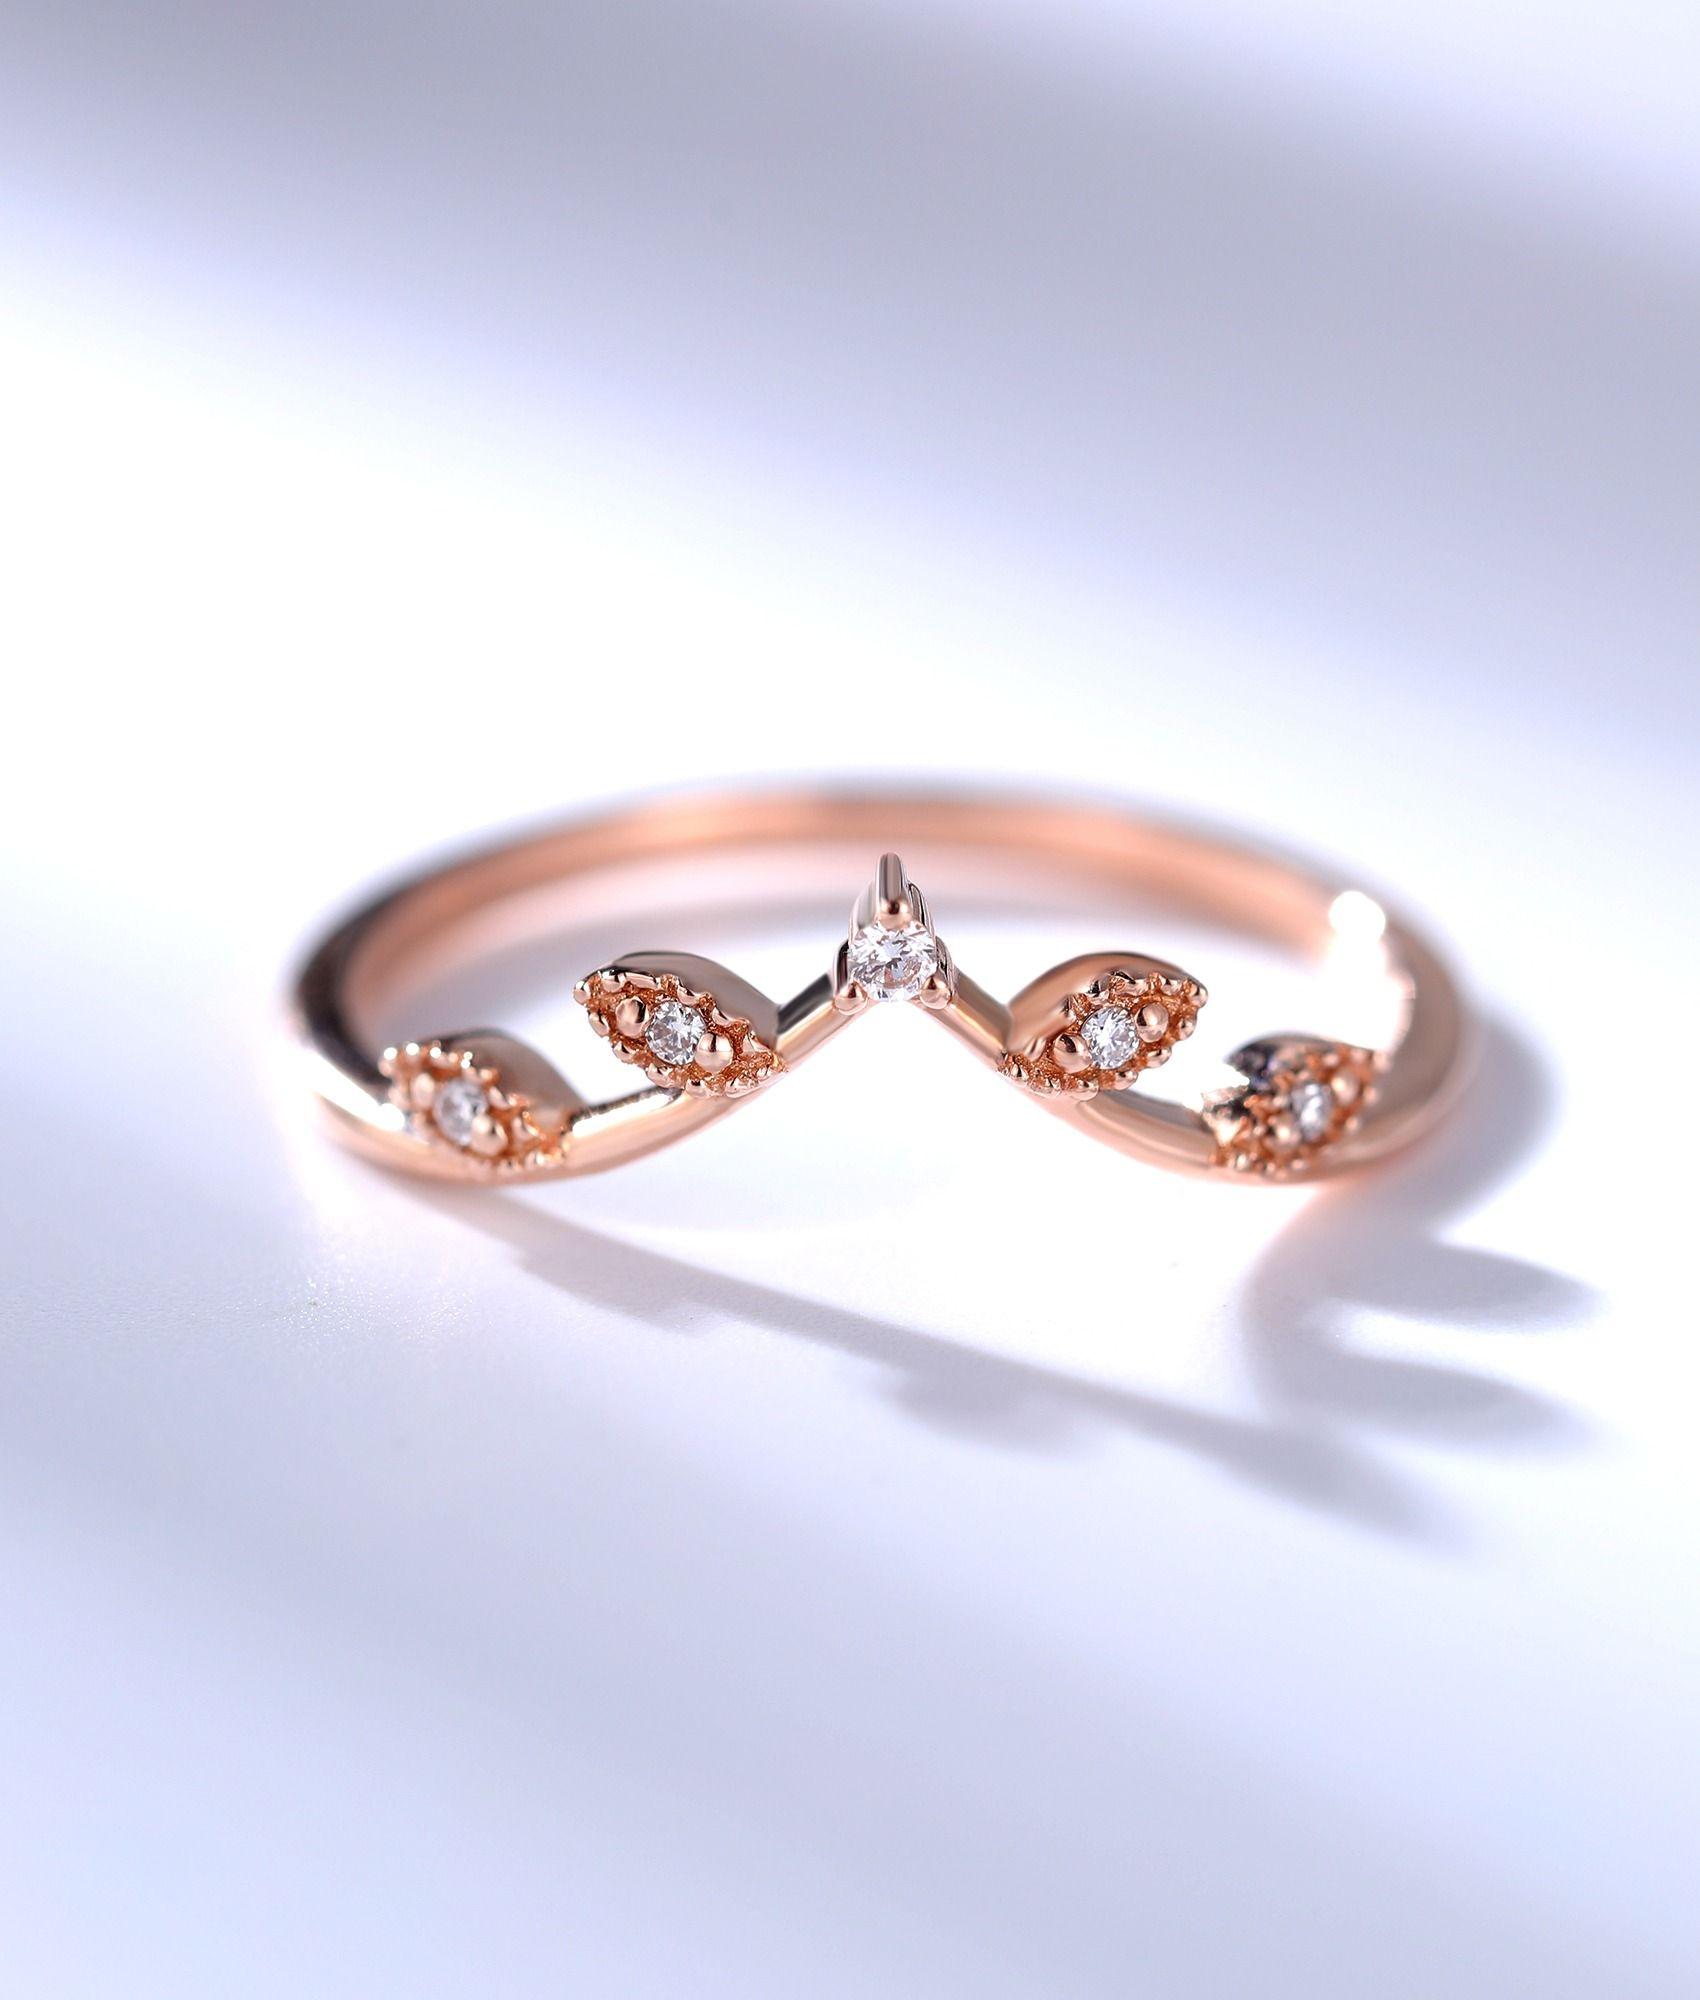 Diamond curved wedding band for women vintage leaf shaped